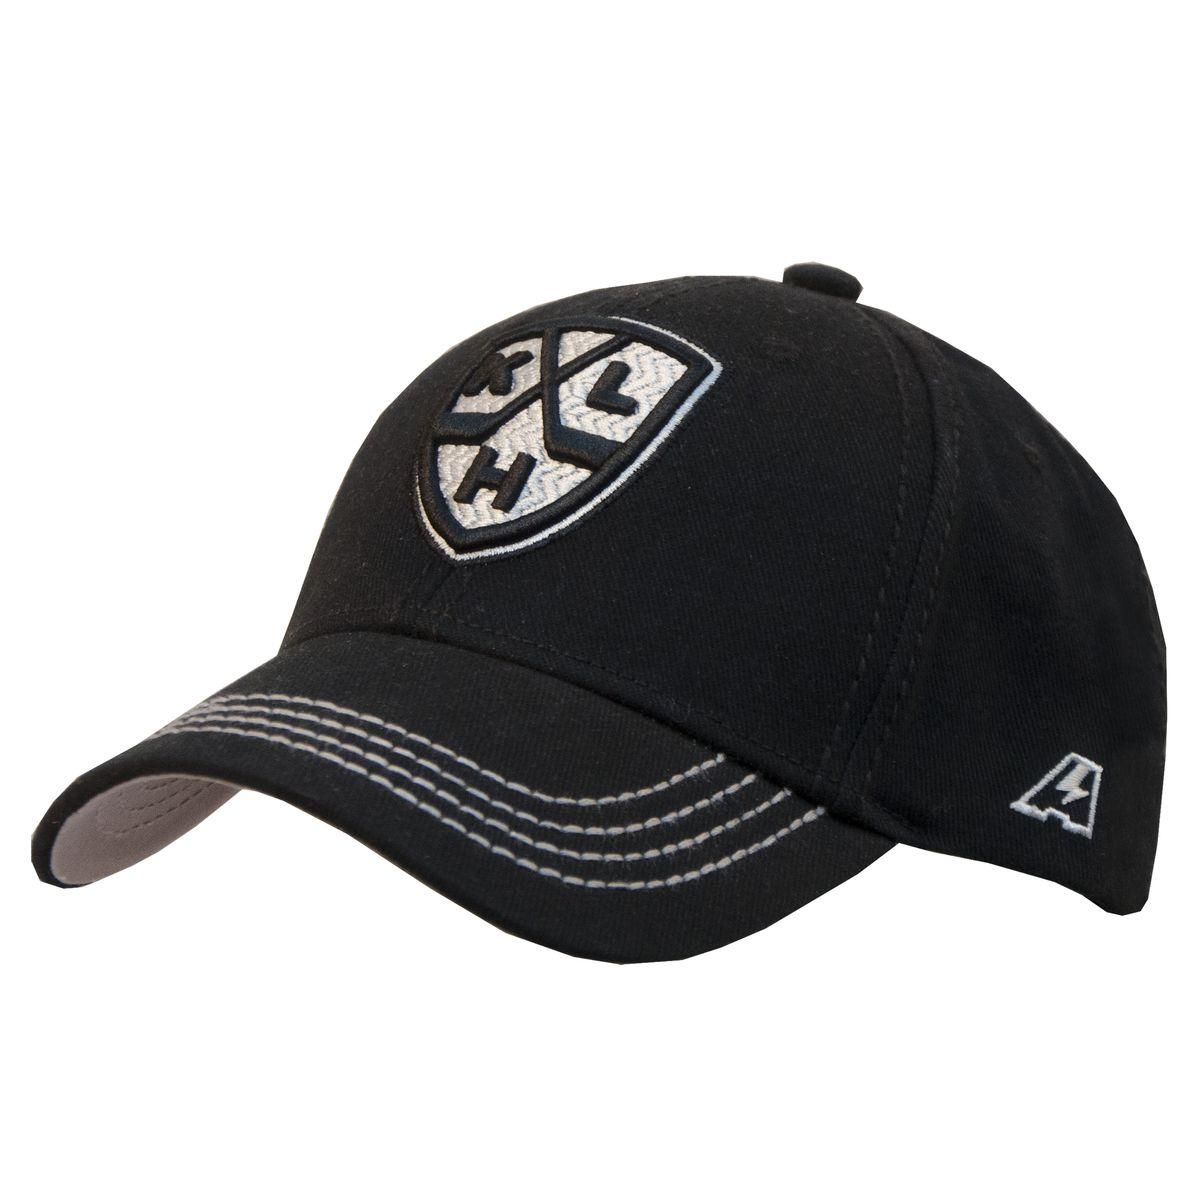 Бейсболка с логотипом ХК